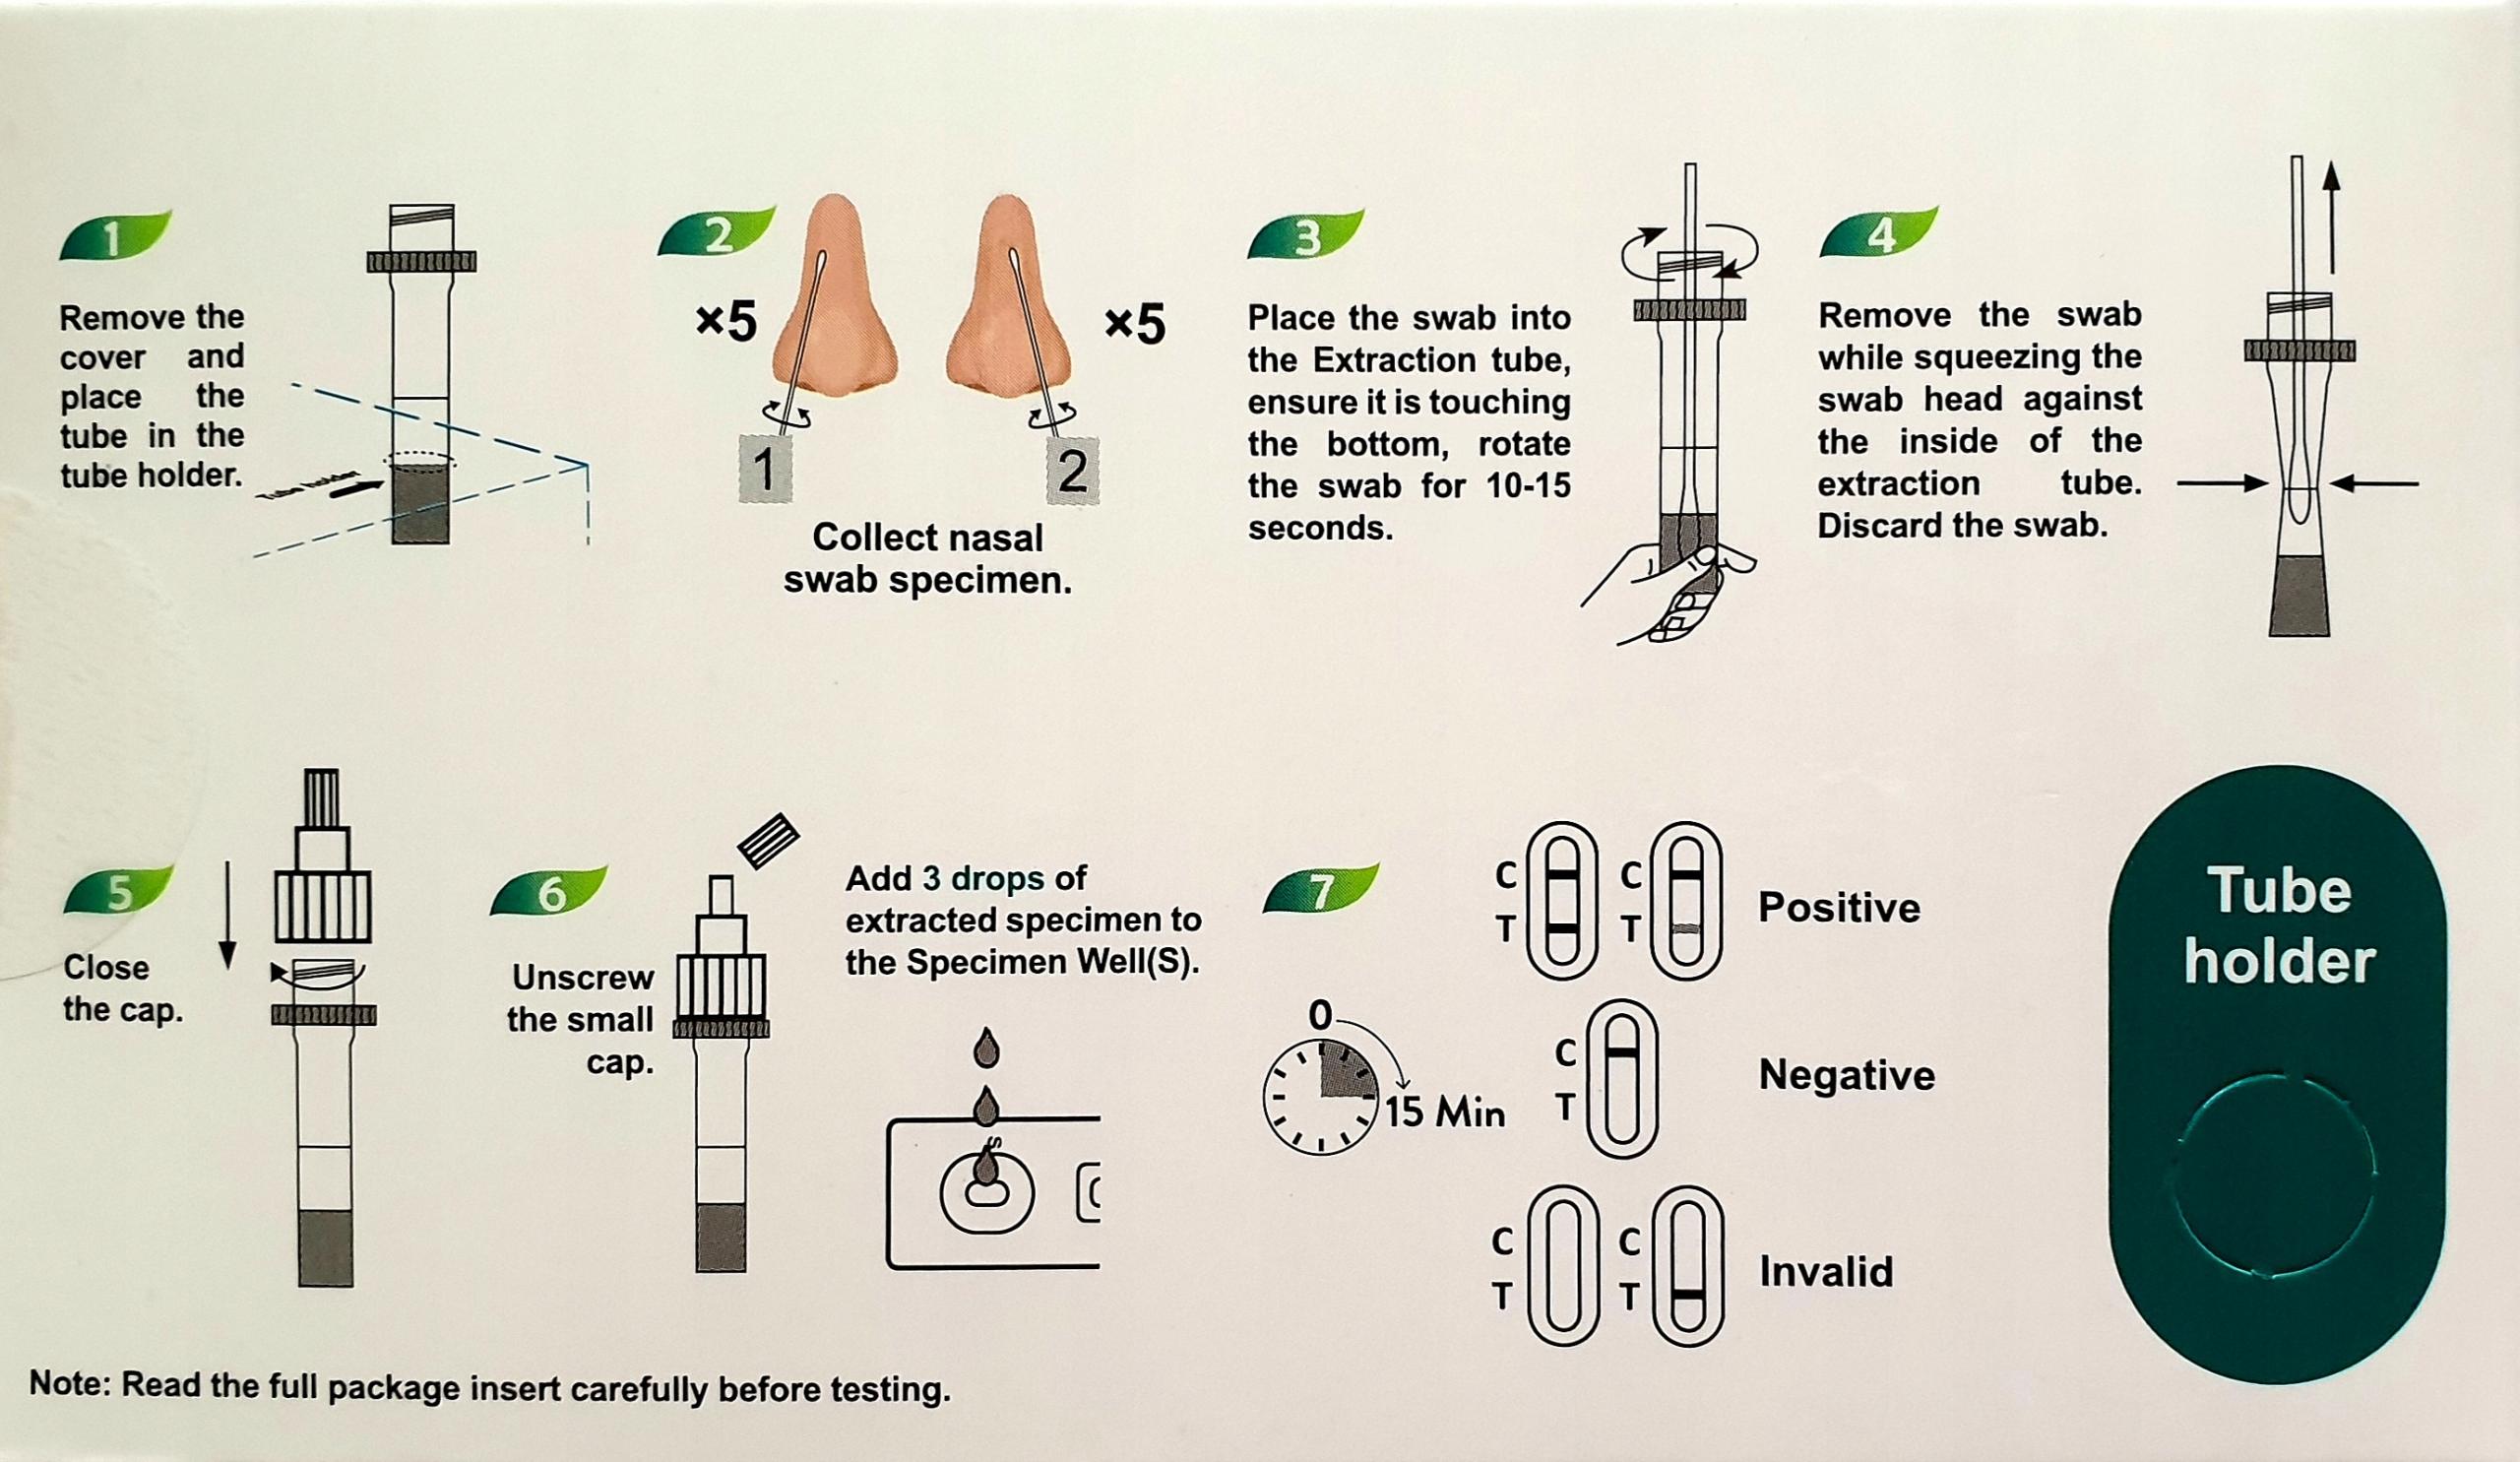 BERIGHT SZYBKI TEST ANTYGENOWY C-19 LEGALNY Kod producenta Beright SARS-CoV-2 Antigen Rapid Test